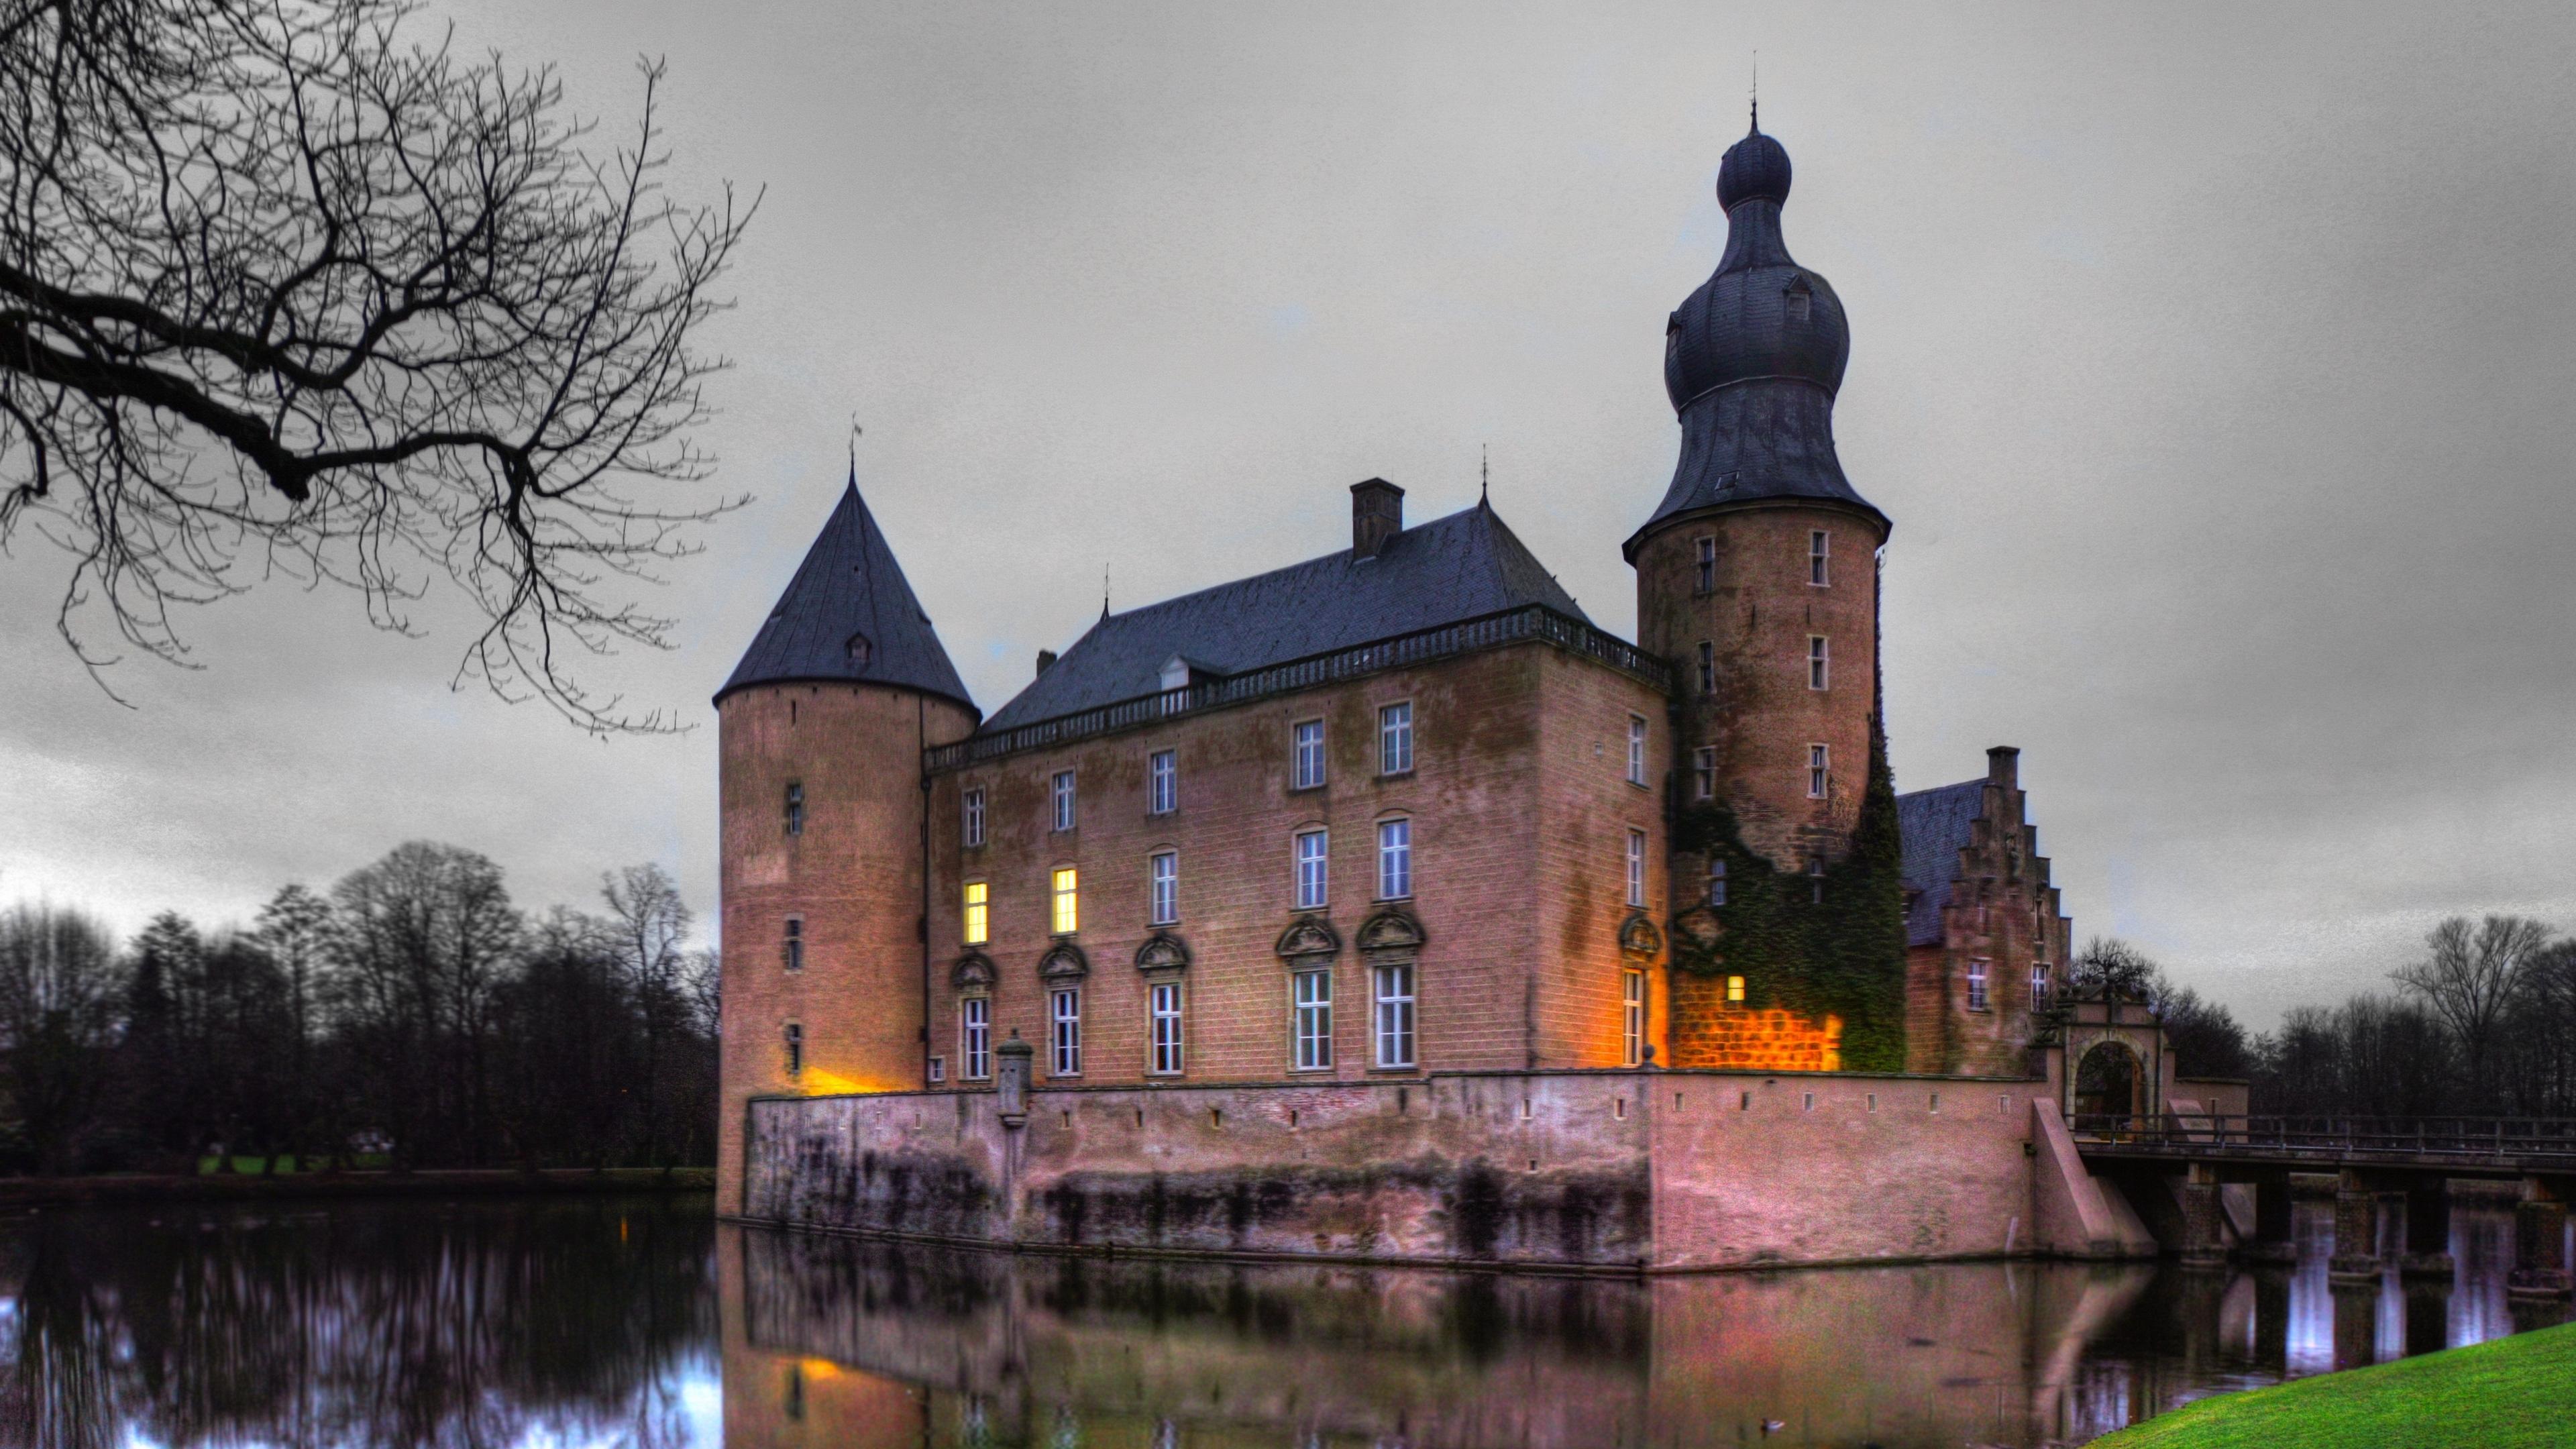 germany castle pond grass beautiful 4k 1538066343 - germany, castle, pond, grass, beautiful 4k - pond, Germany, Castle